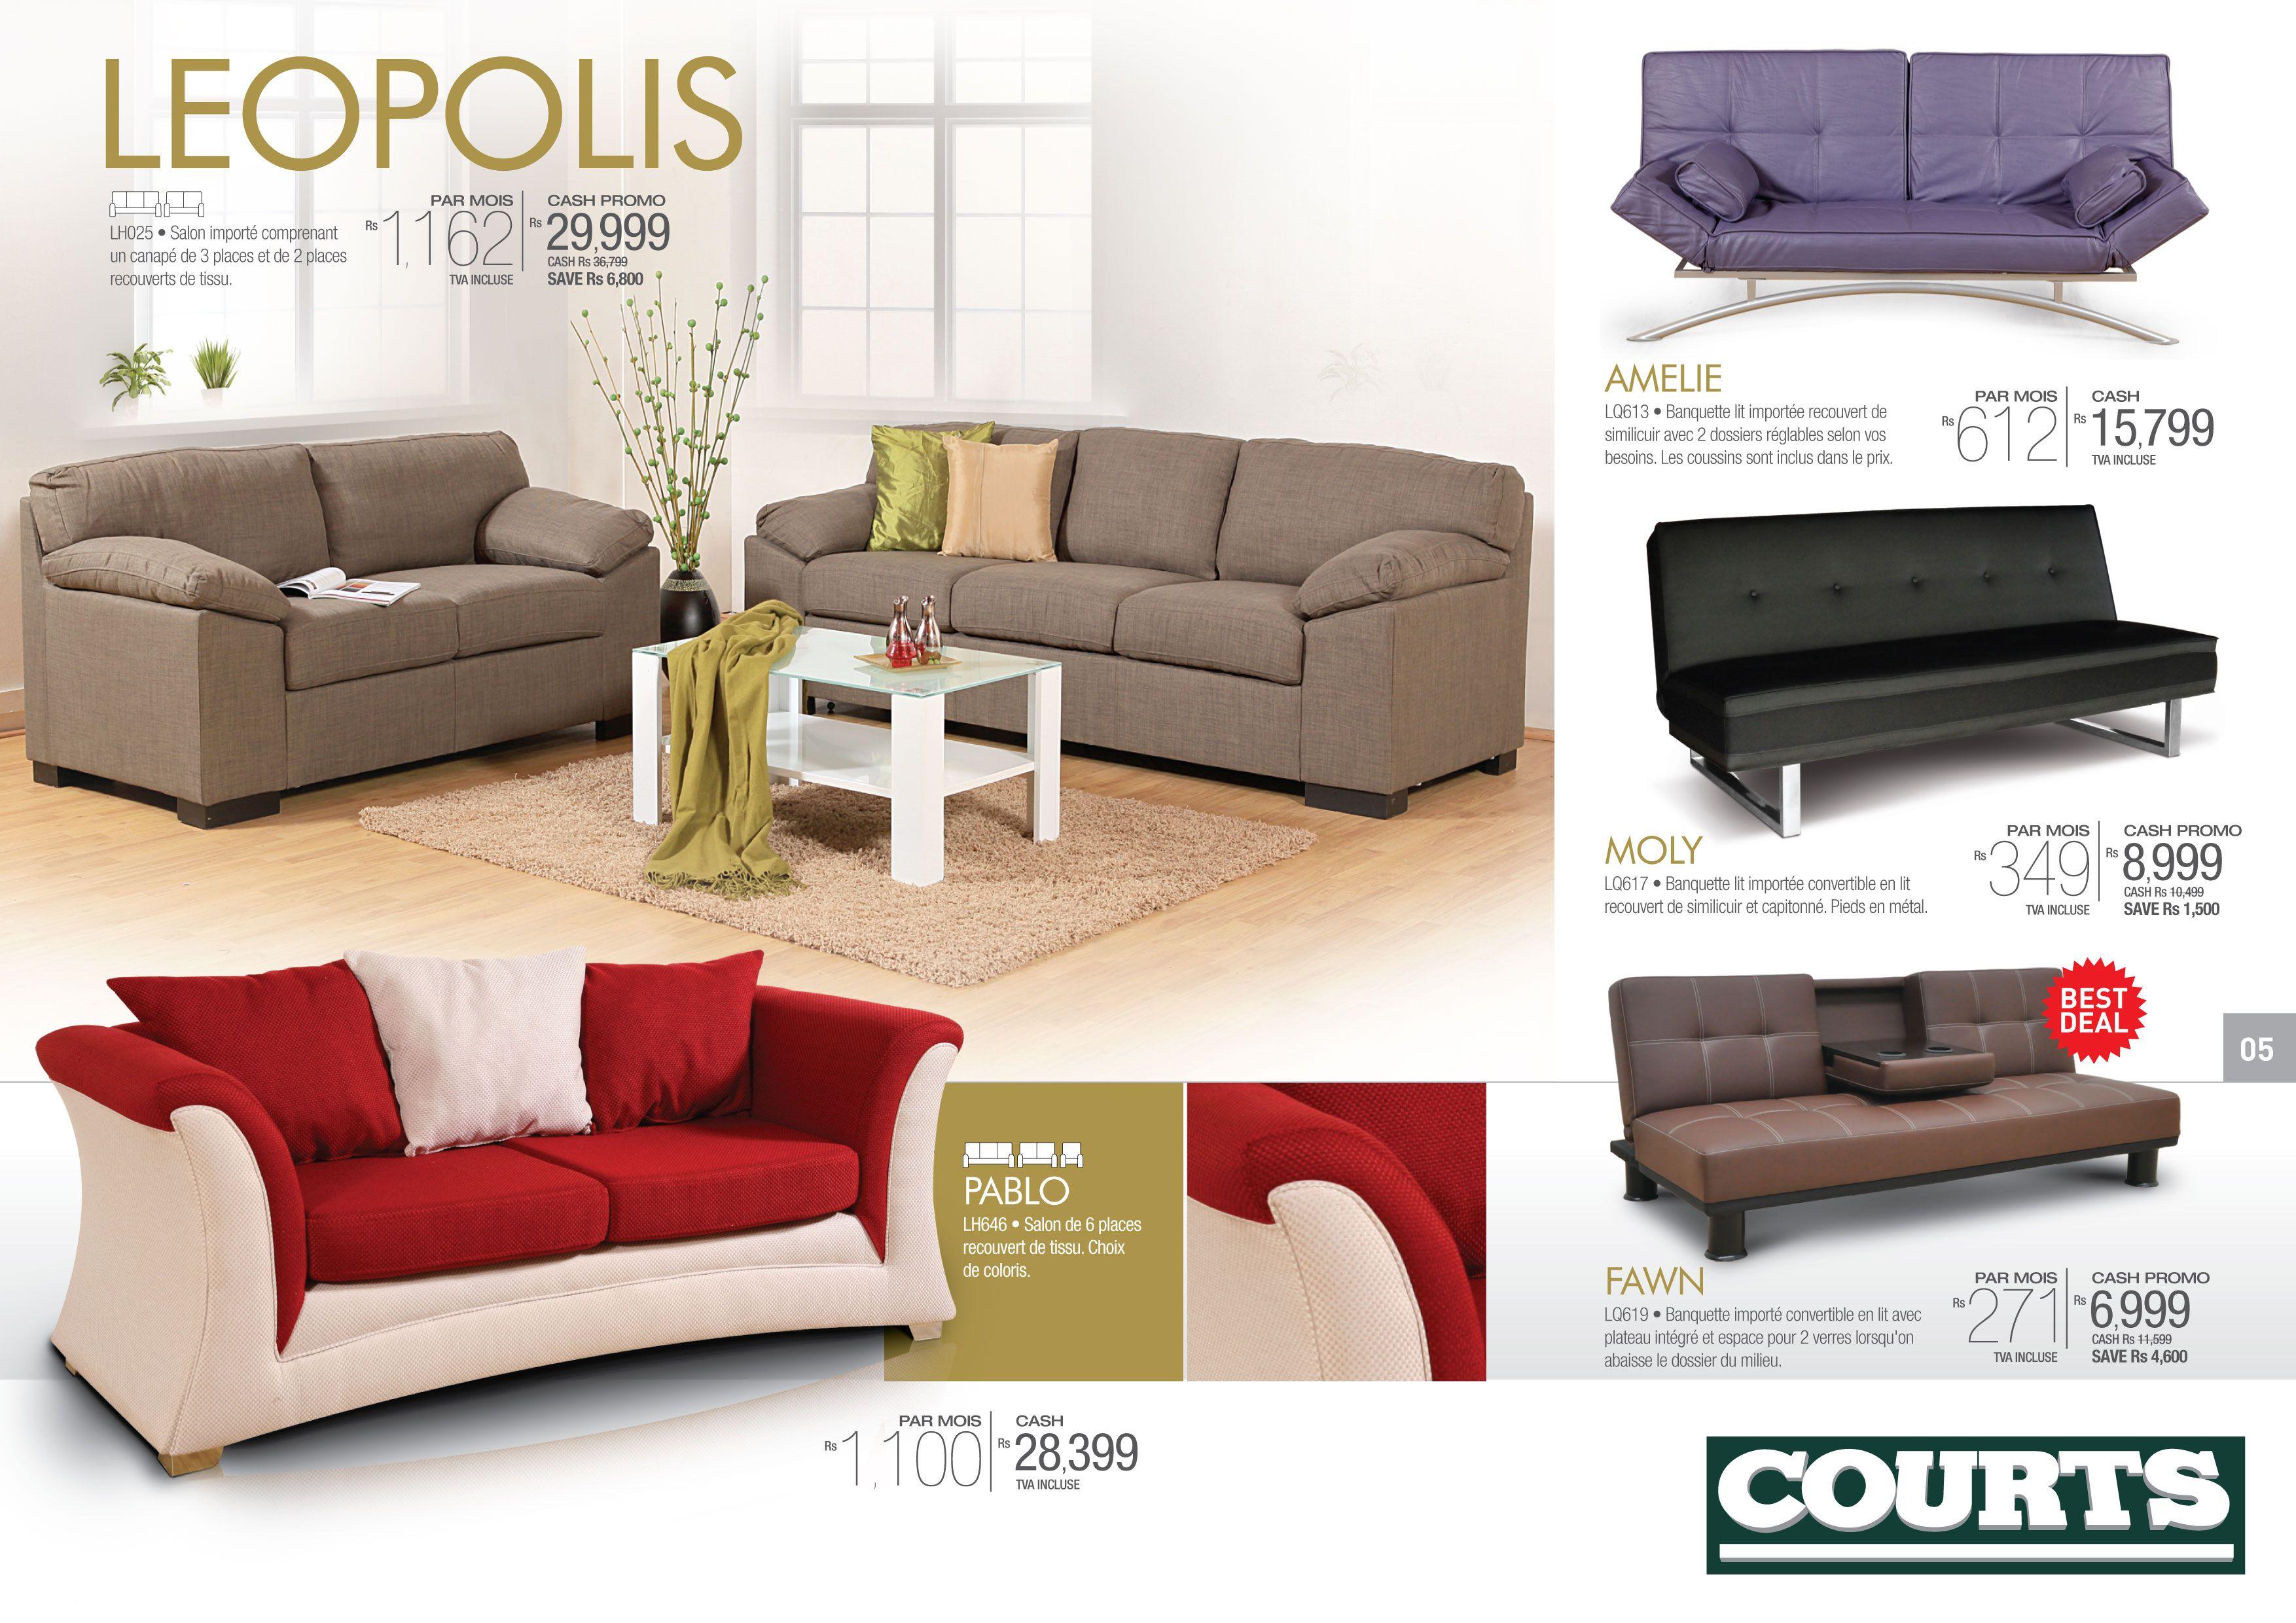 Courts Mauritius Sofa Set